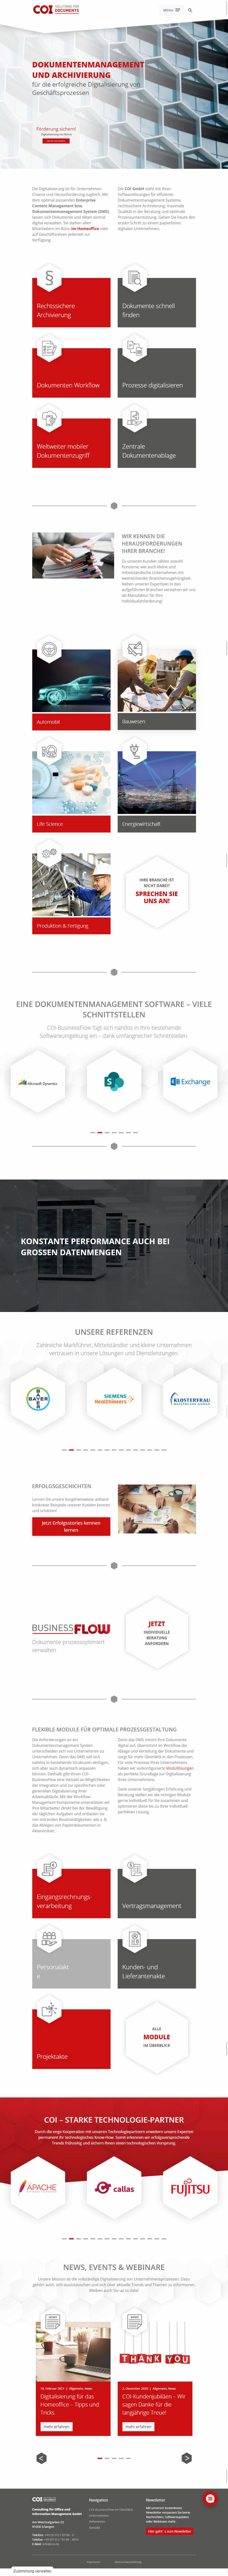 coi-dokumentenmanagement-webdesign-mobile